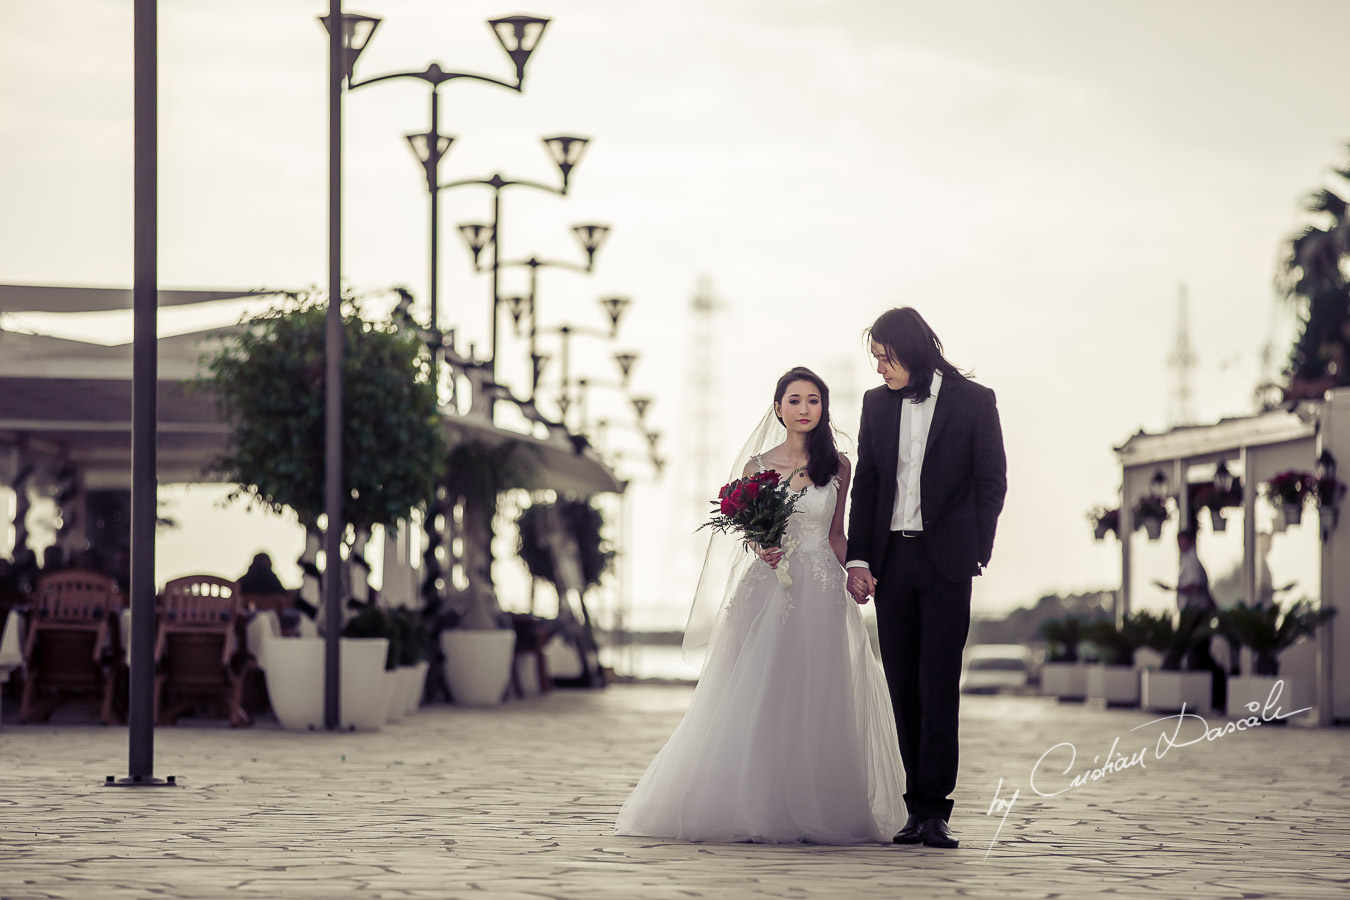 Pre Wedding Photoshoot in Cyprus - 03